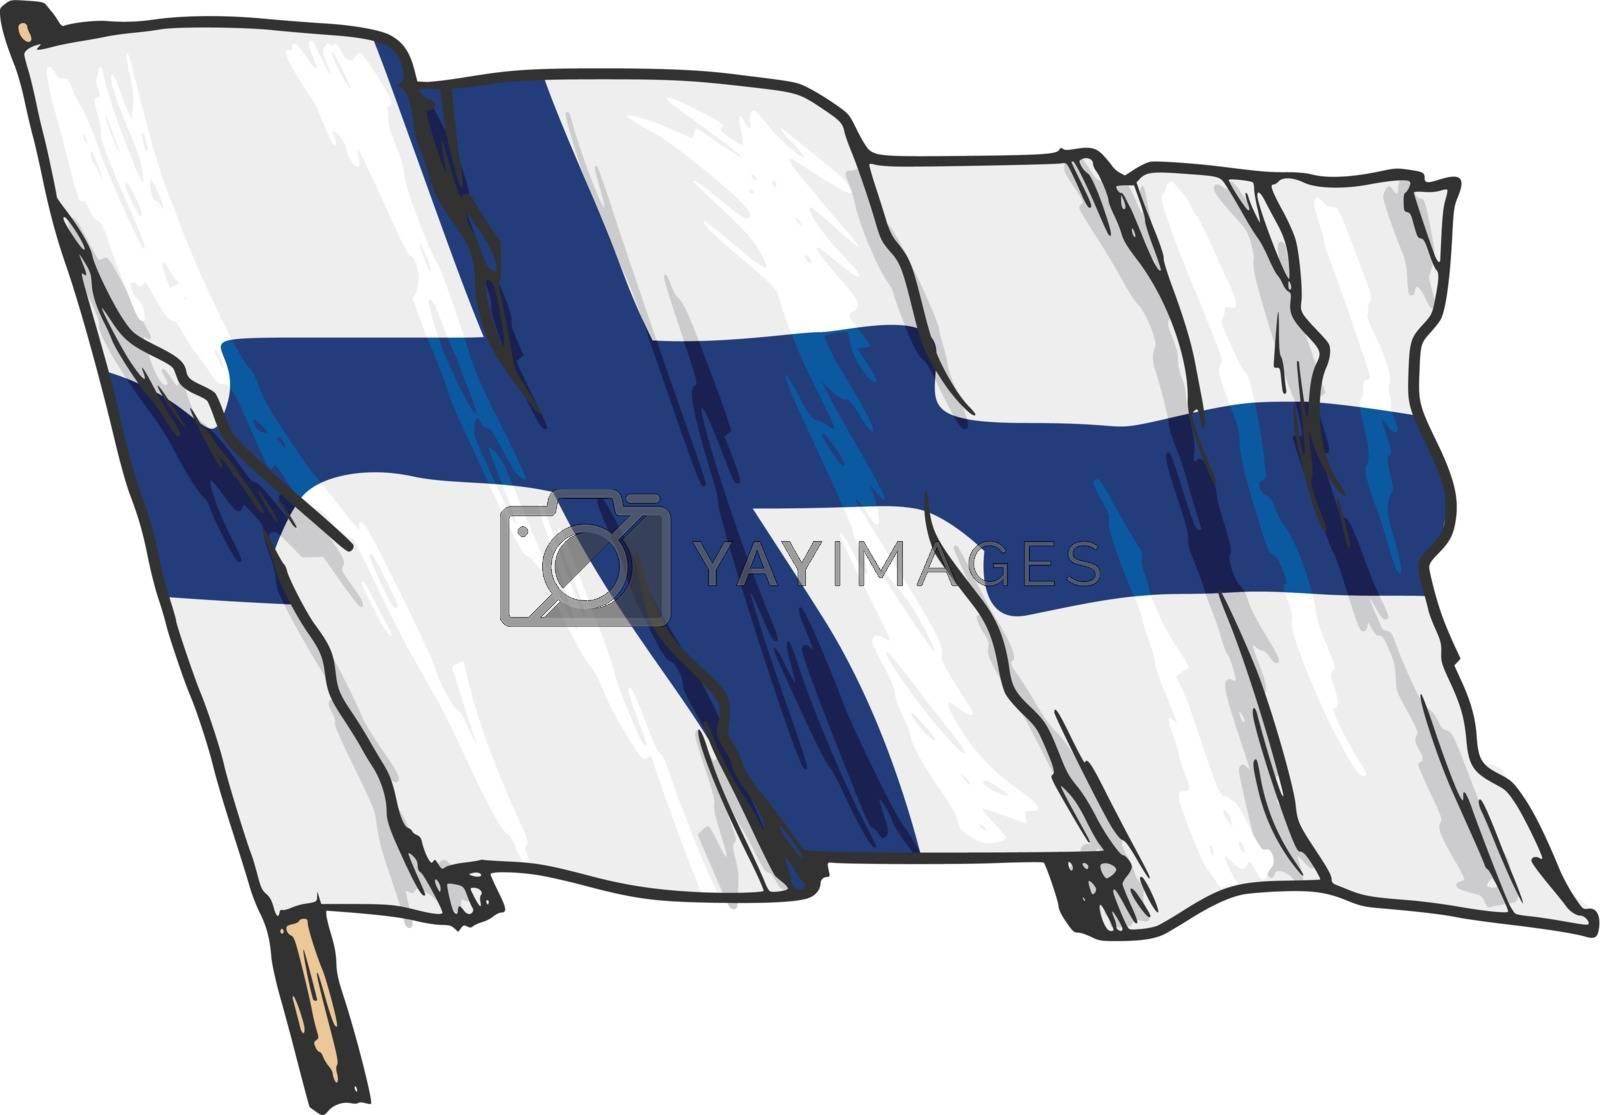 hand drawn, sketch, illustration of flag of Finland